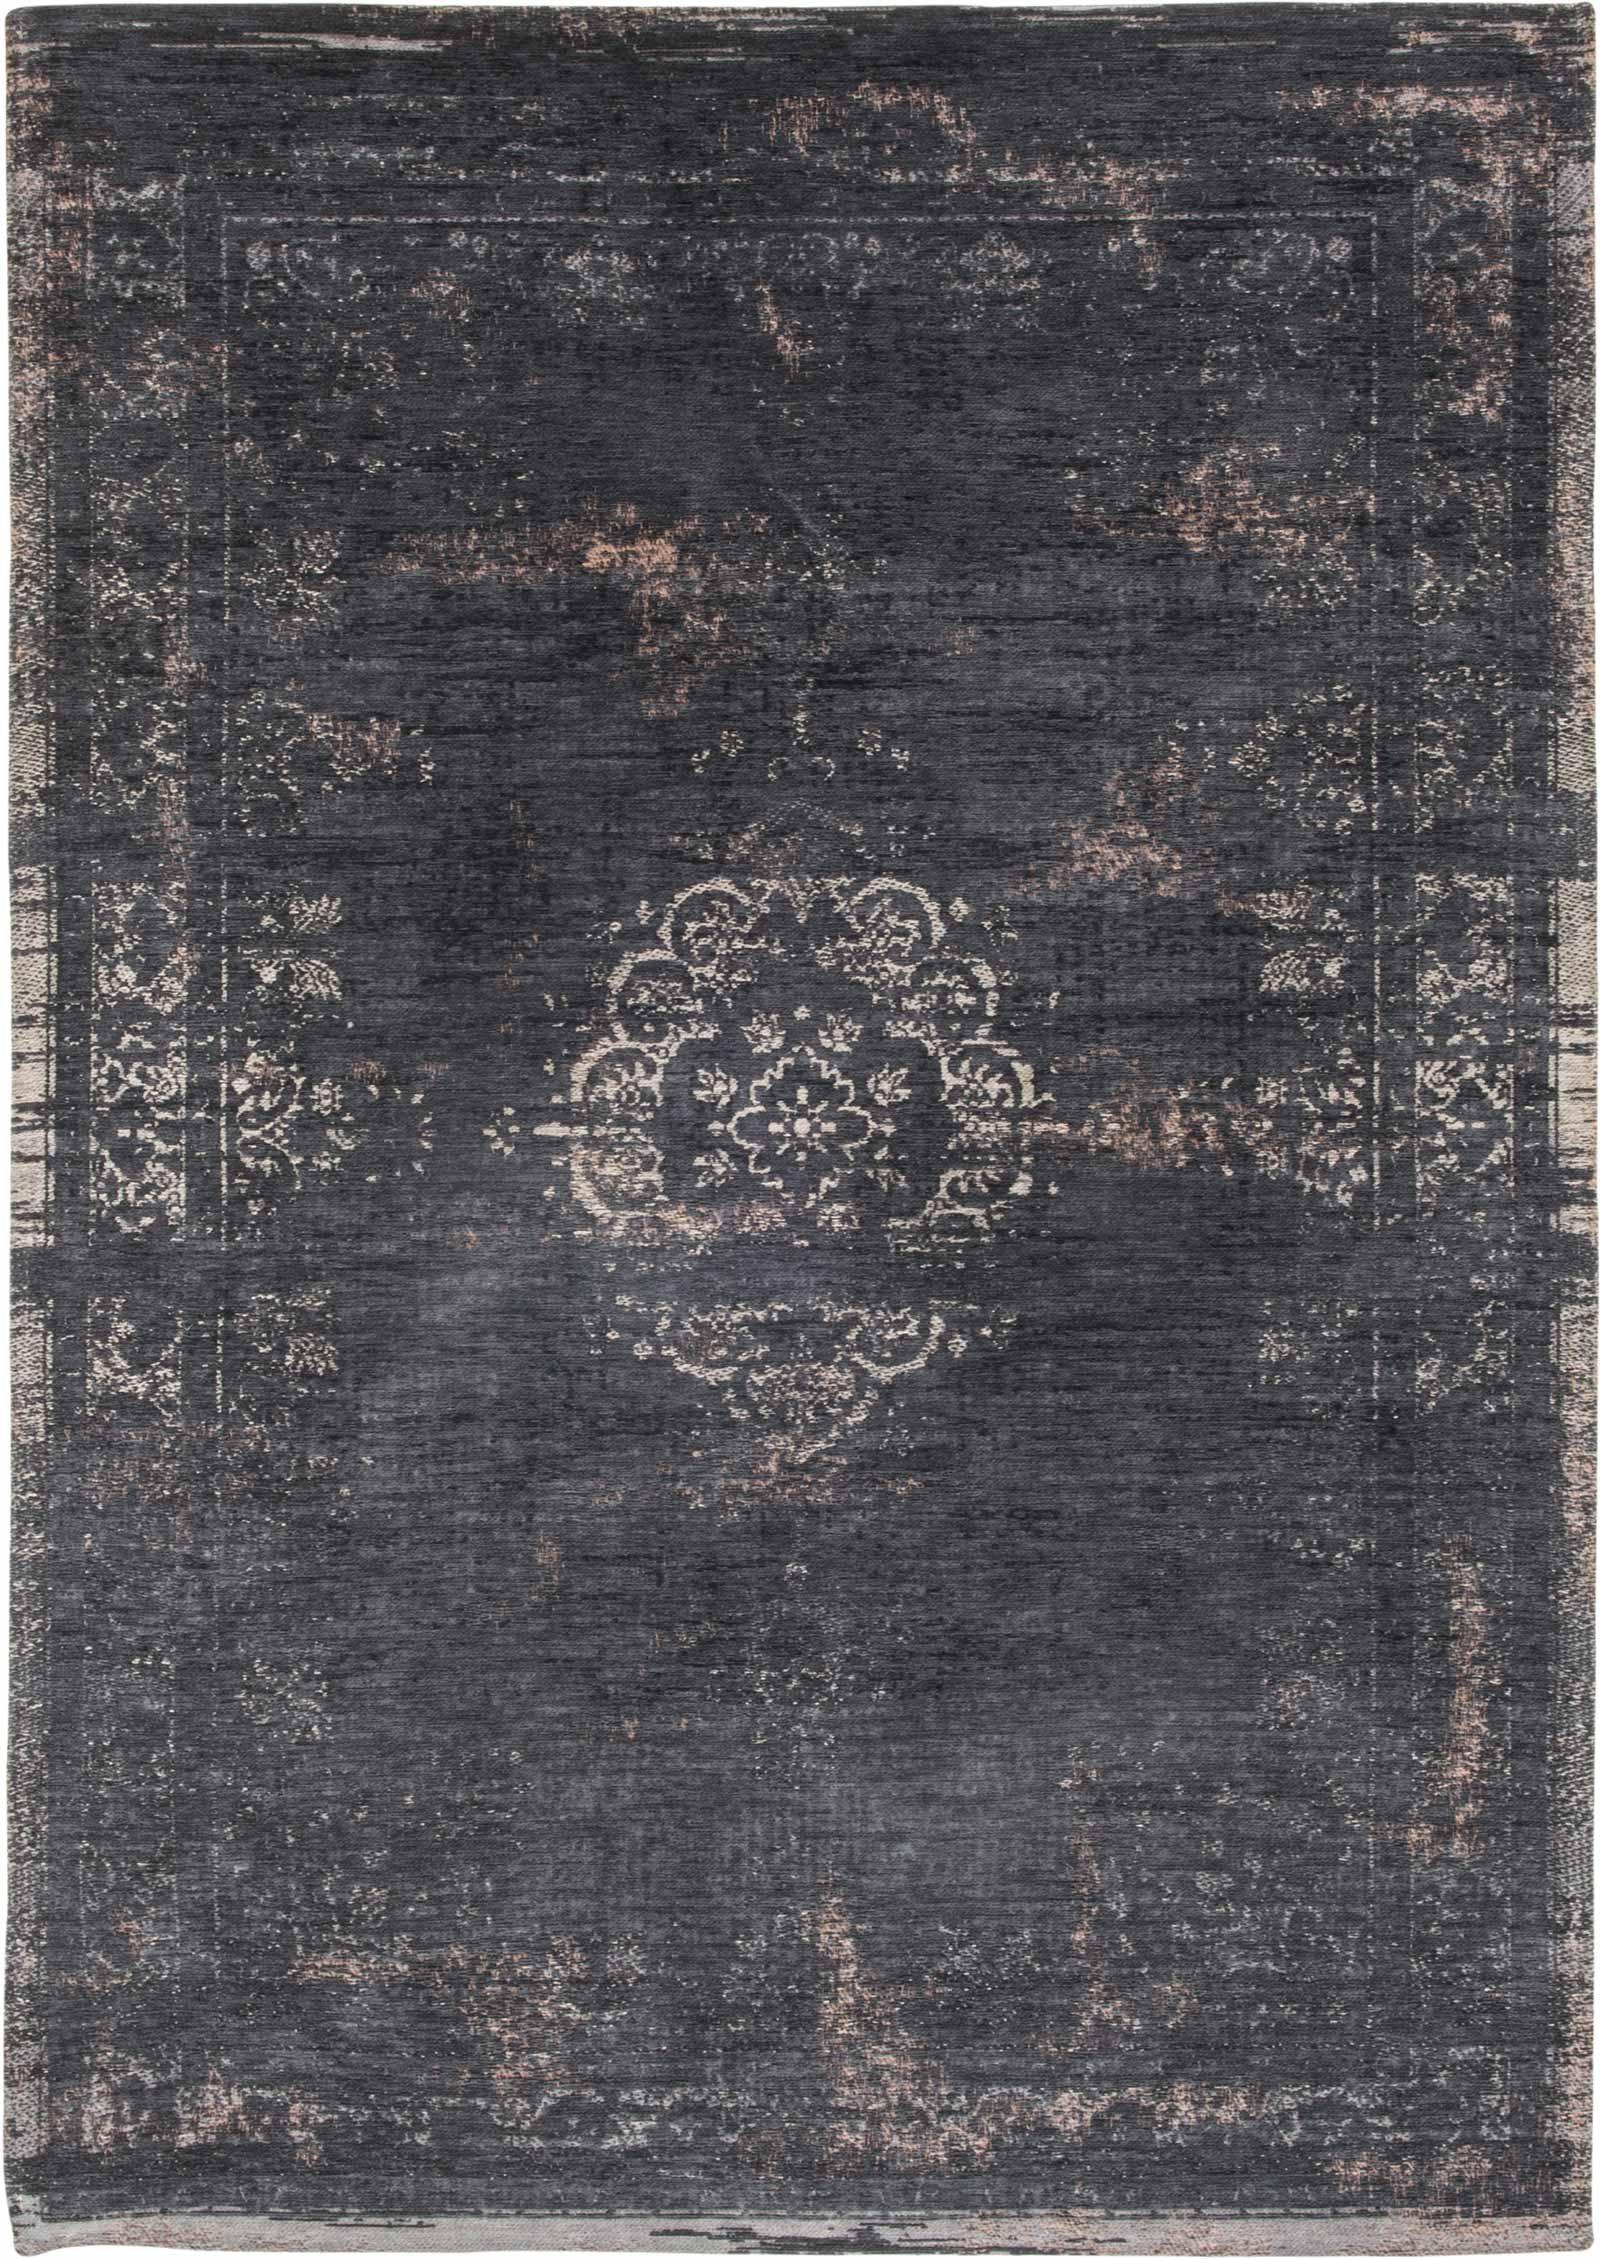 louis de poortere teppich fading world mineral black 8263 medallion design